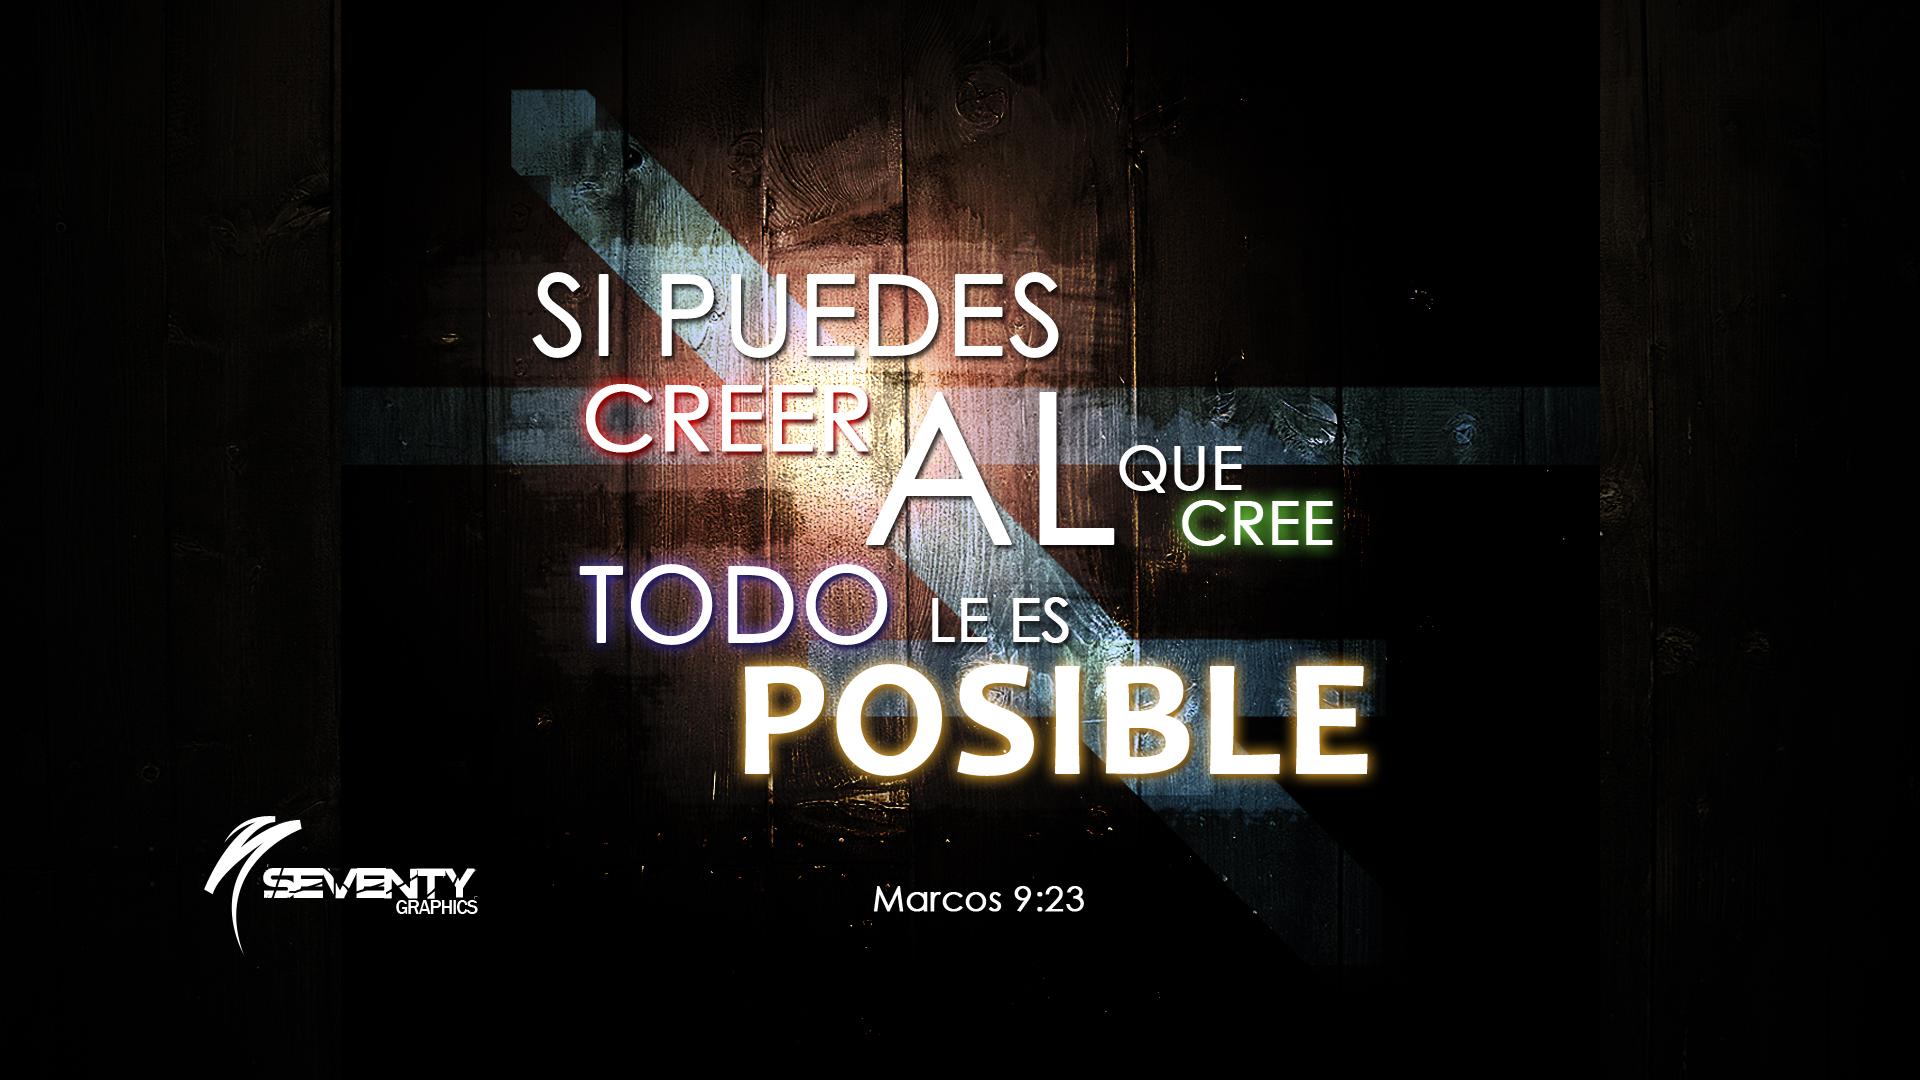 Marcos 9:23 by alejandrodearmas77 on DeviantArt